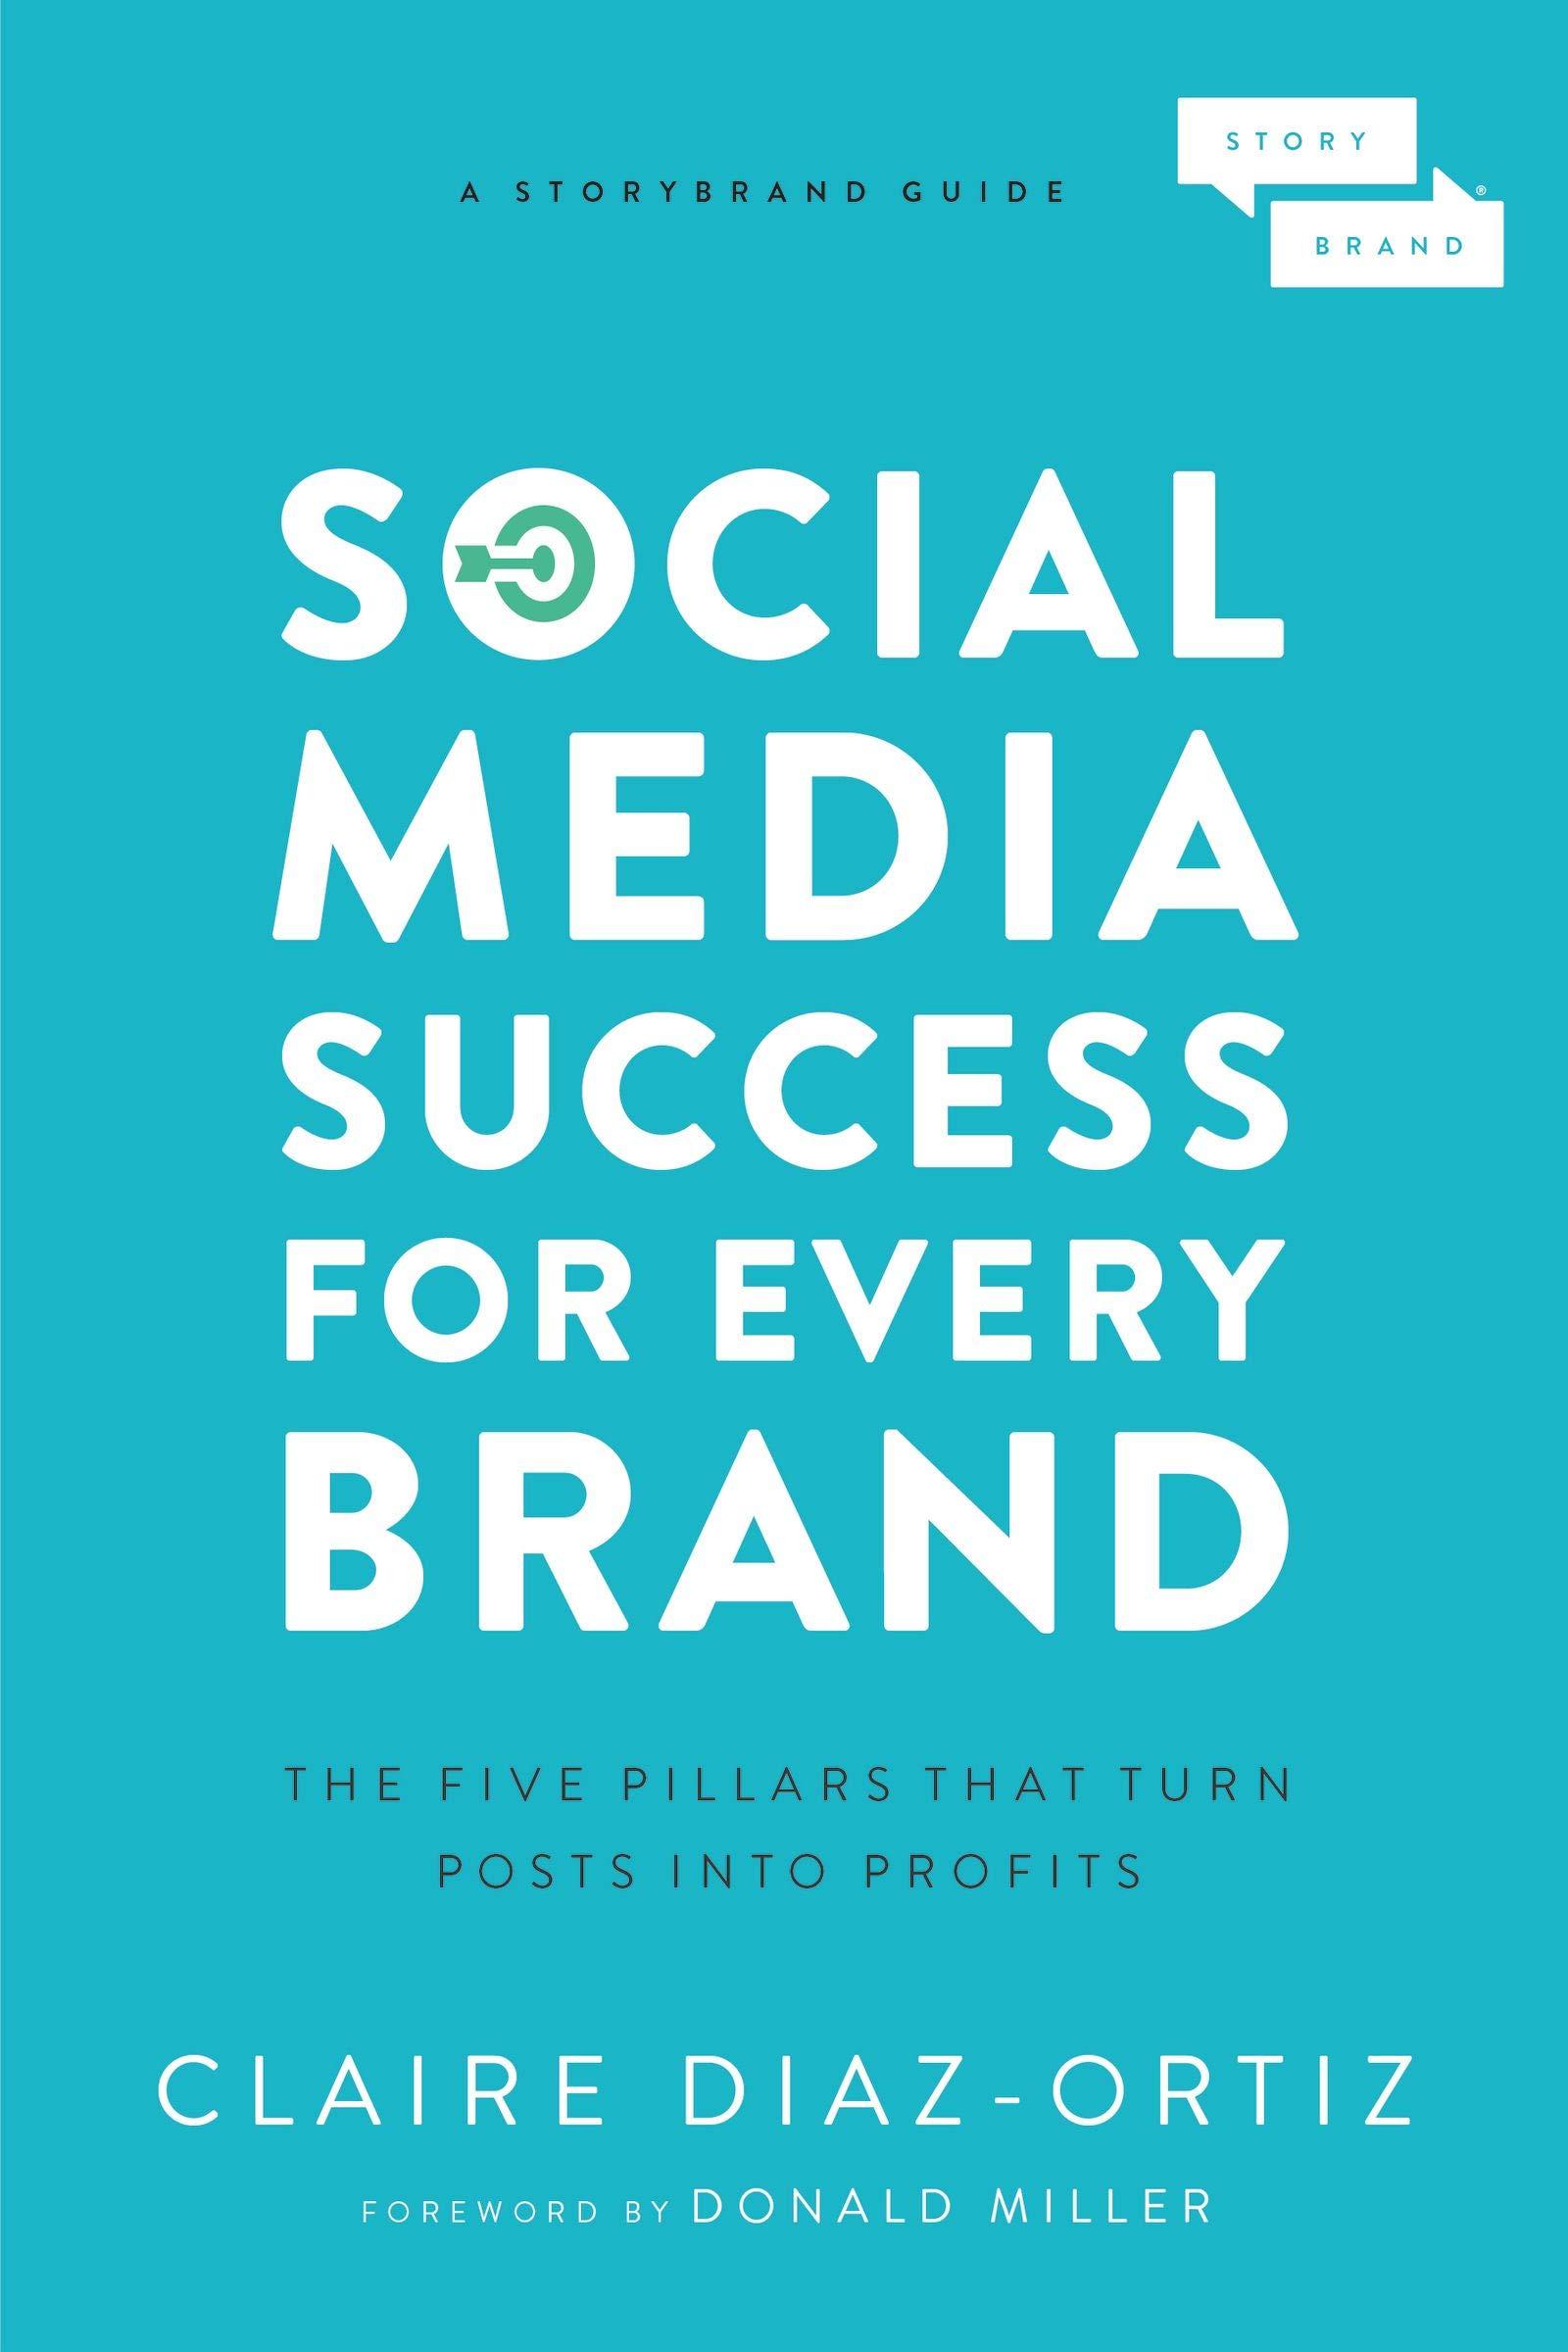 Social Media Success for Every Brand – Claire Diaz-Ortiz